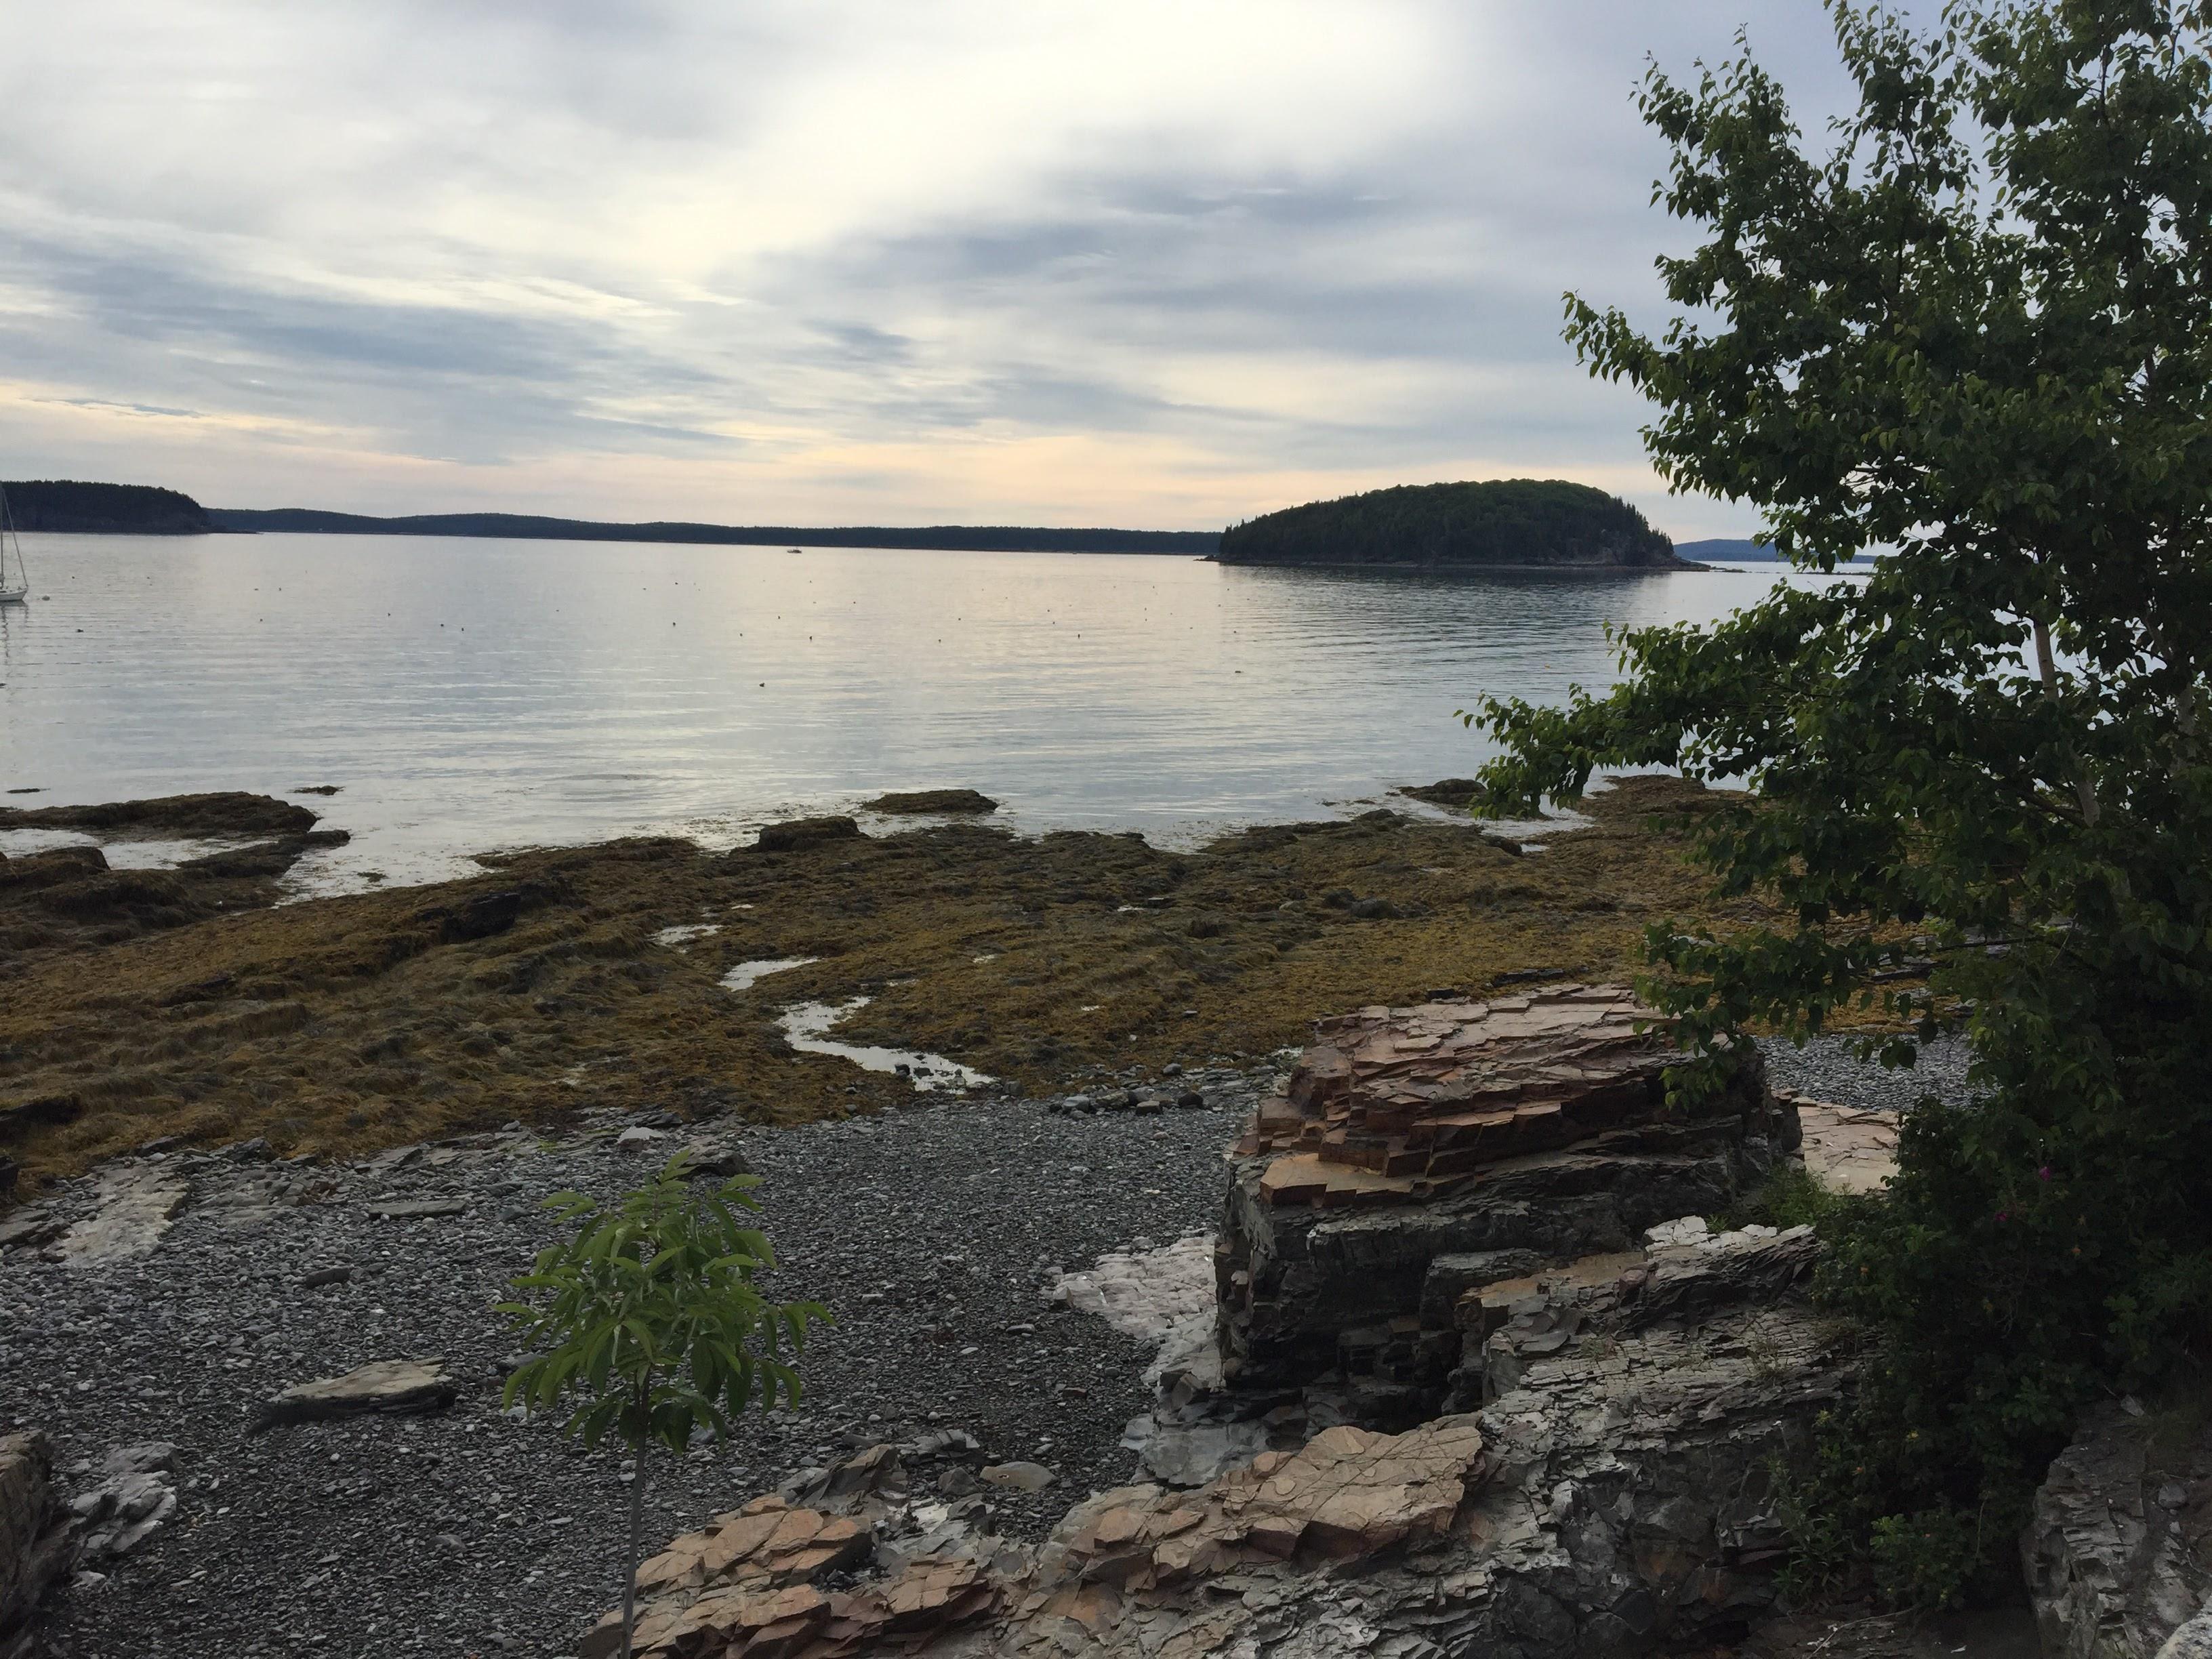 2017-07-24 Acadia NP 01